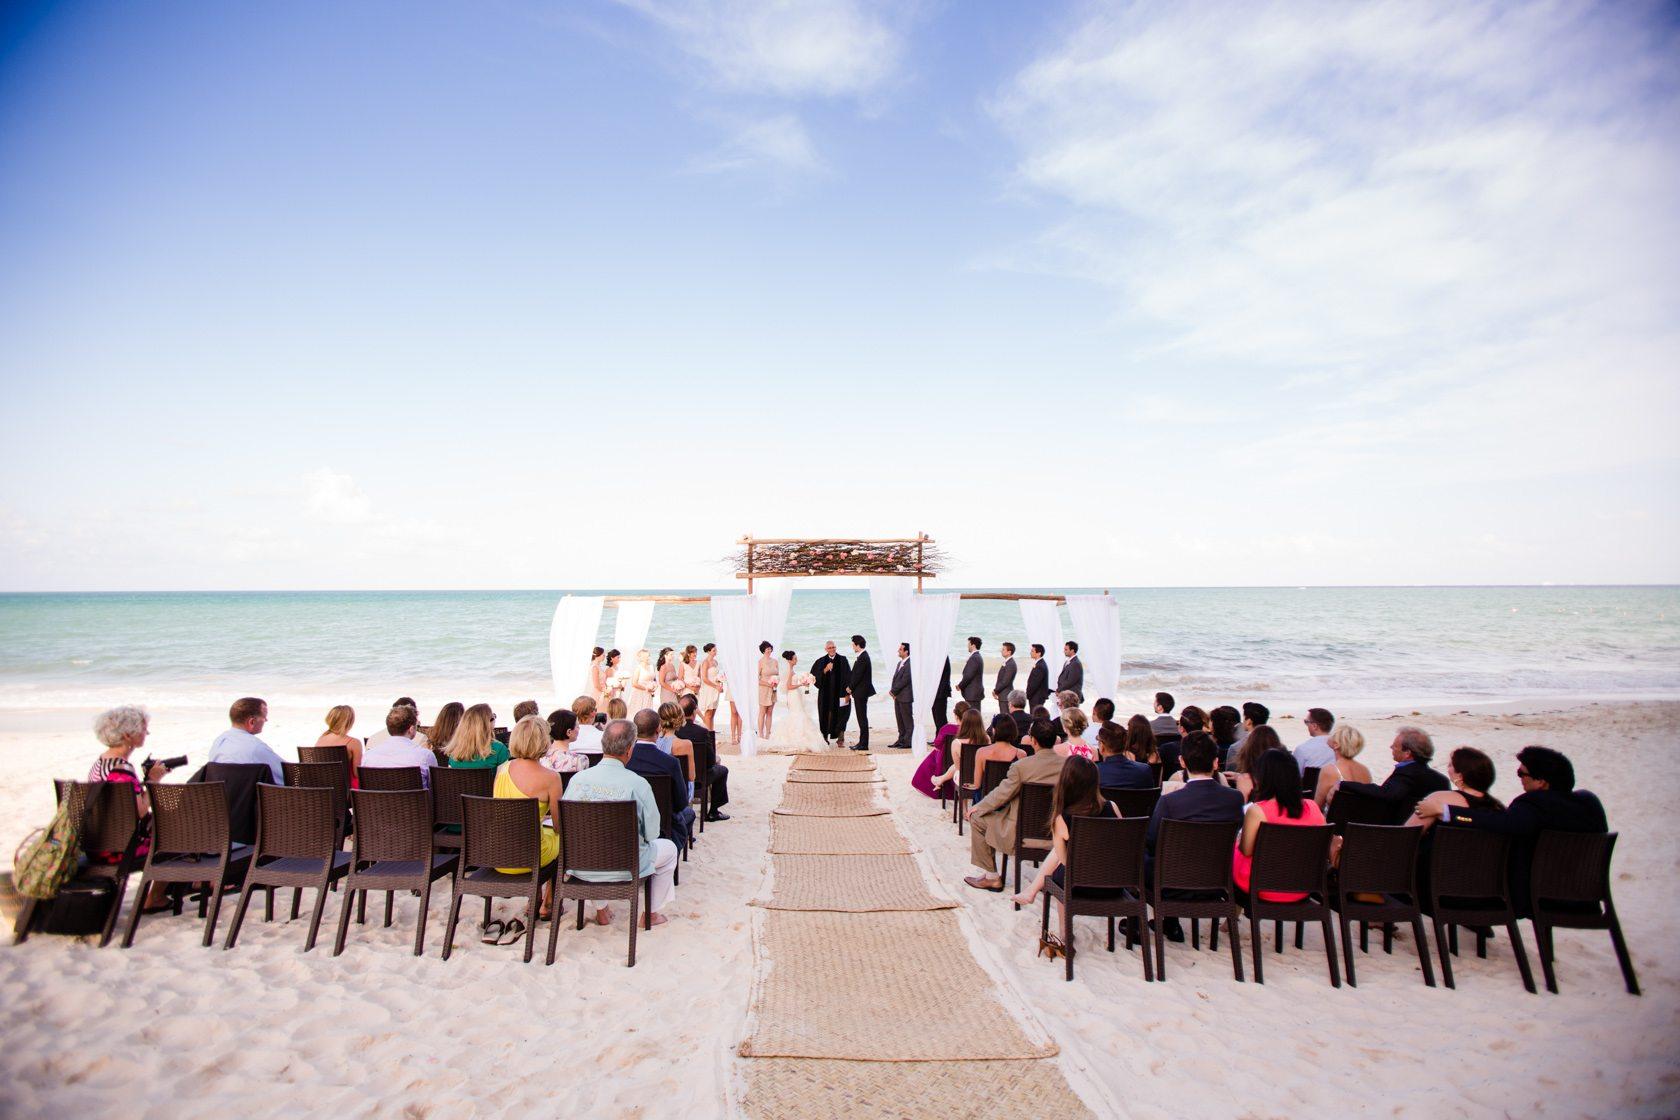 Fairmont_Mayakoba_Wedding_047.jpg